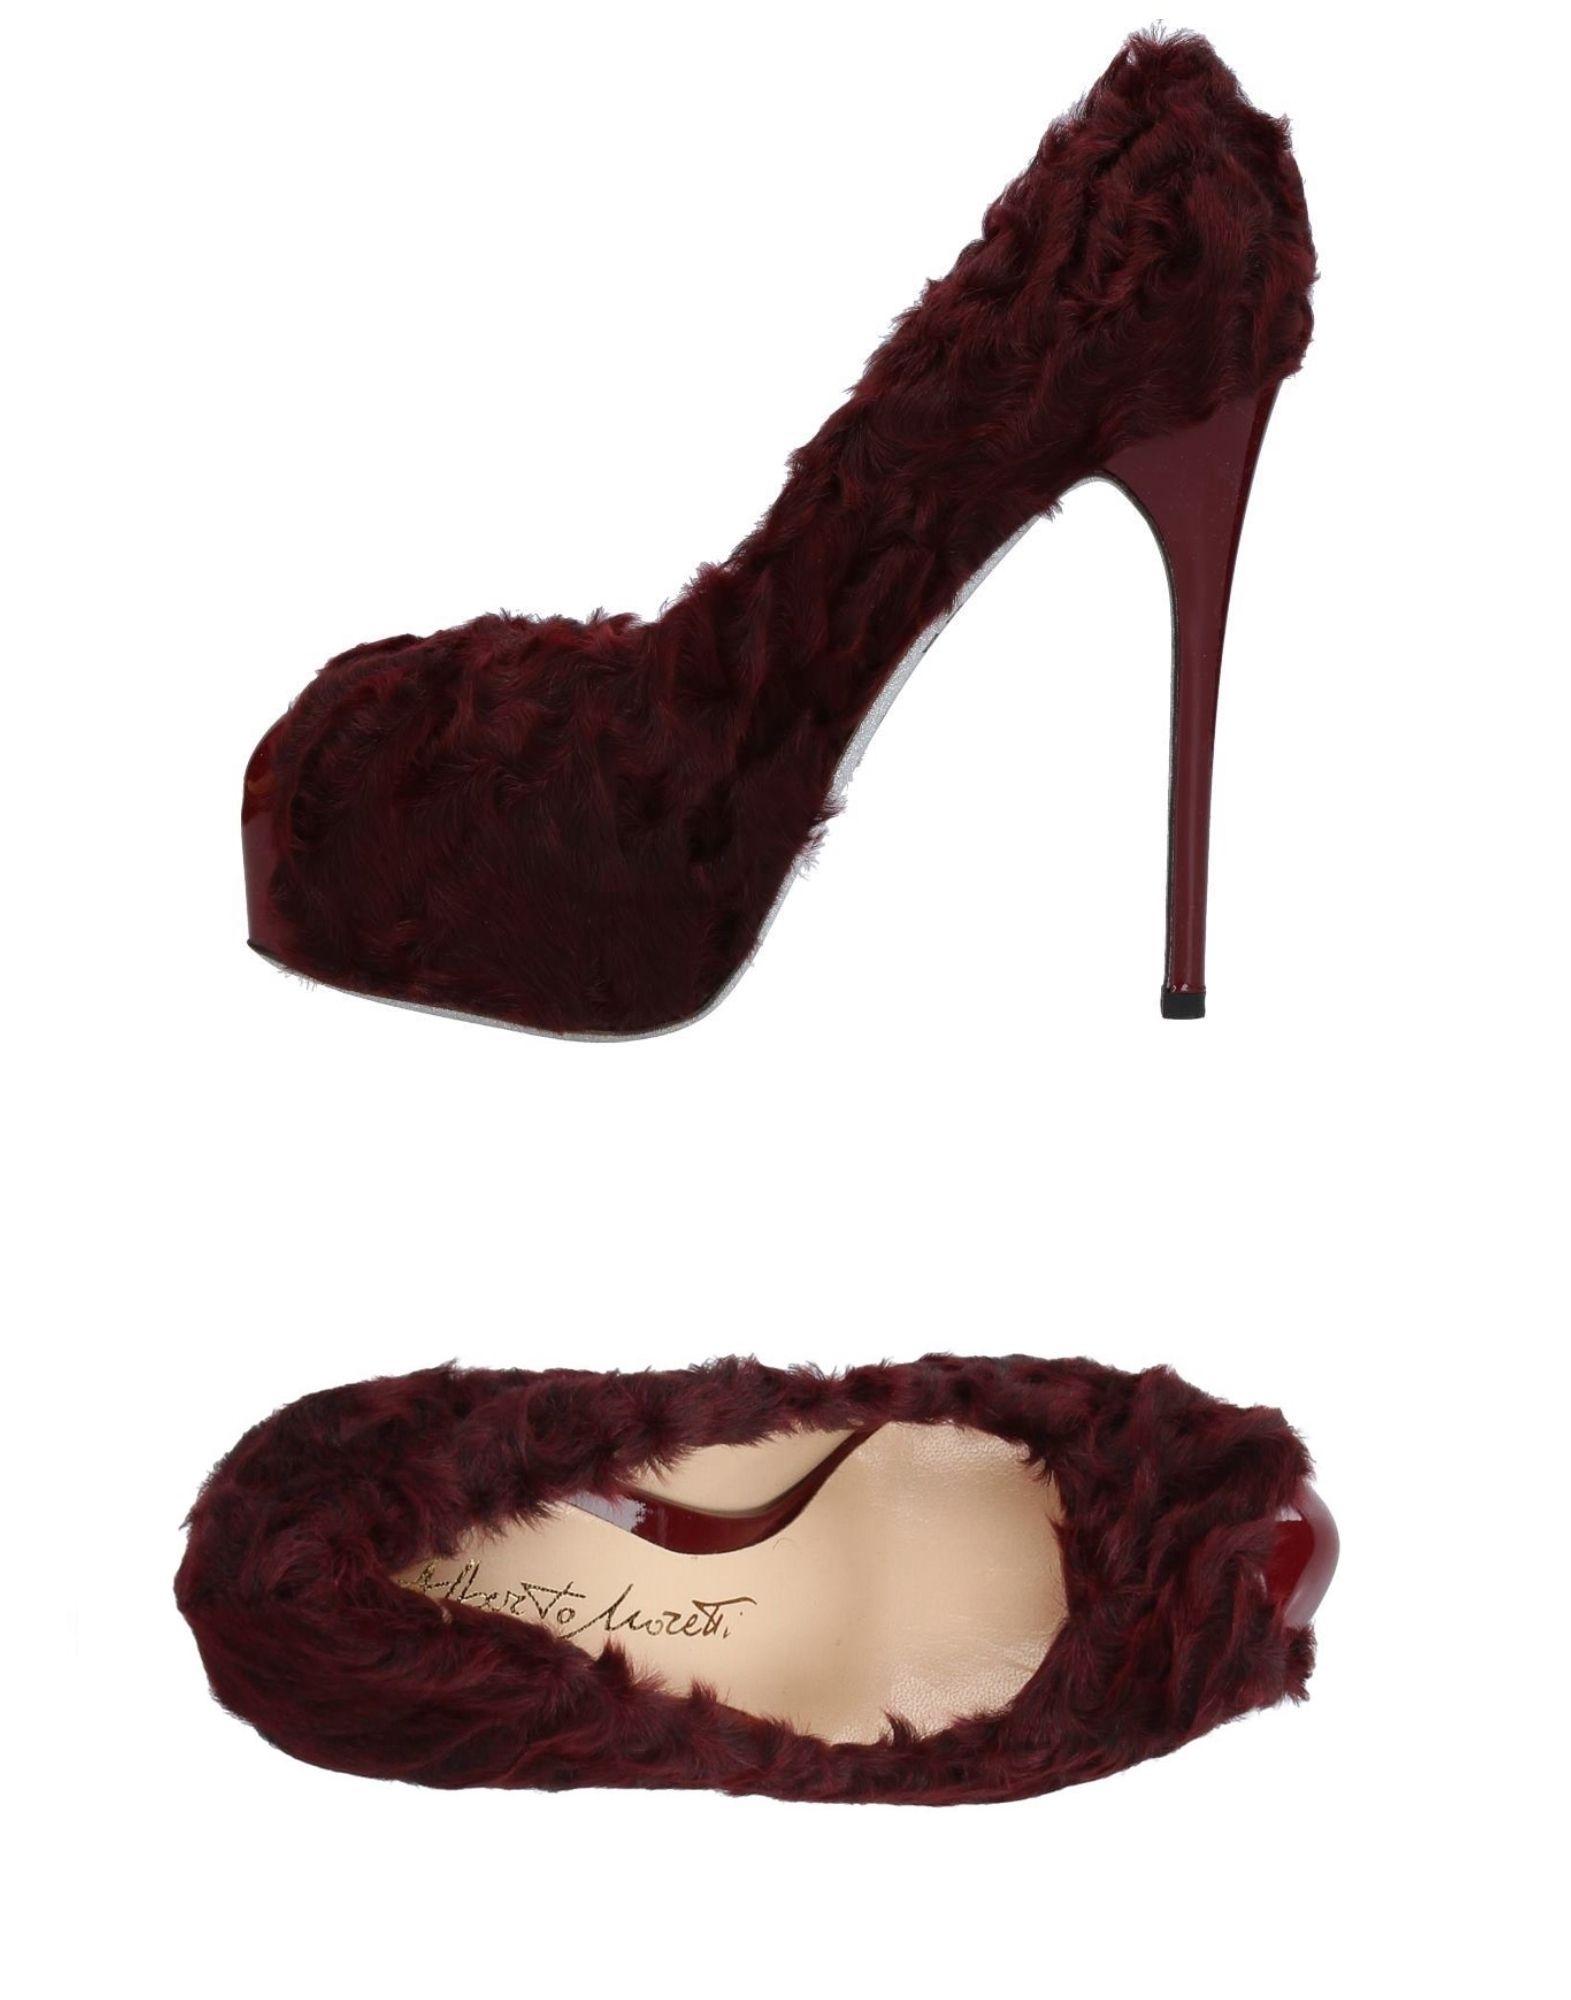 Alberto Moretti Pumps Damen  11402713ED Gute Qualität beliebte Schuhe